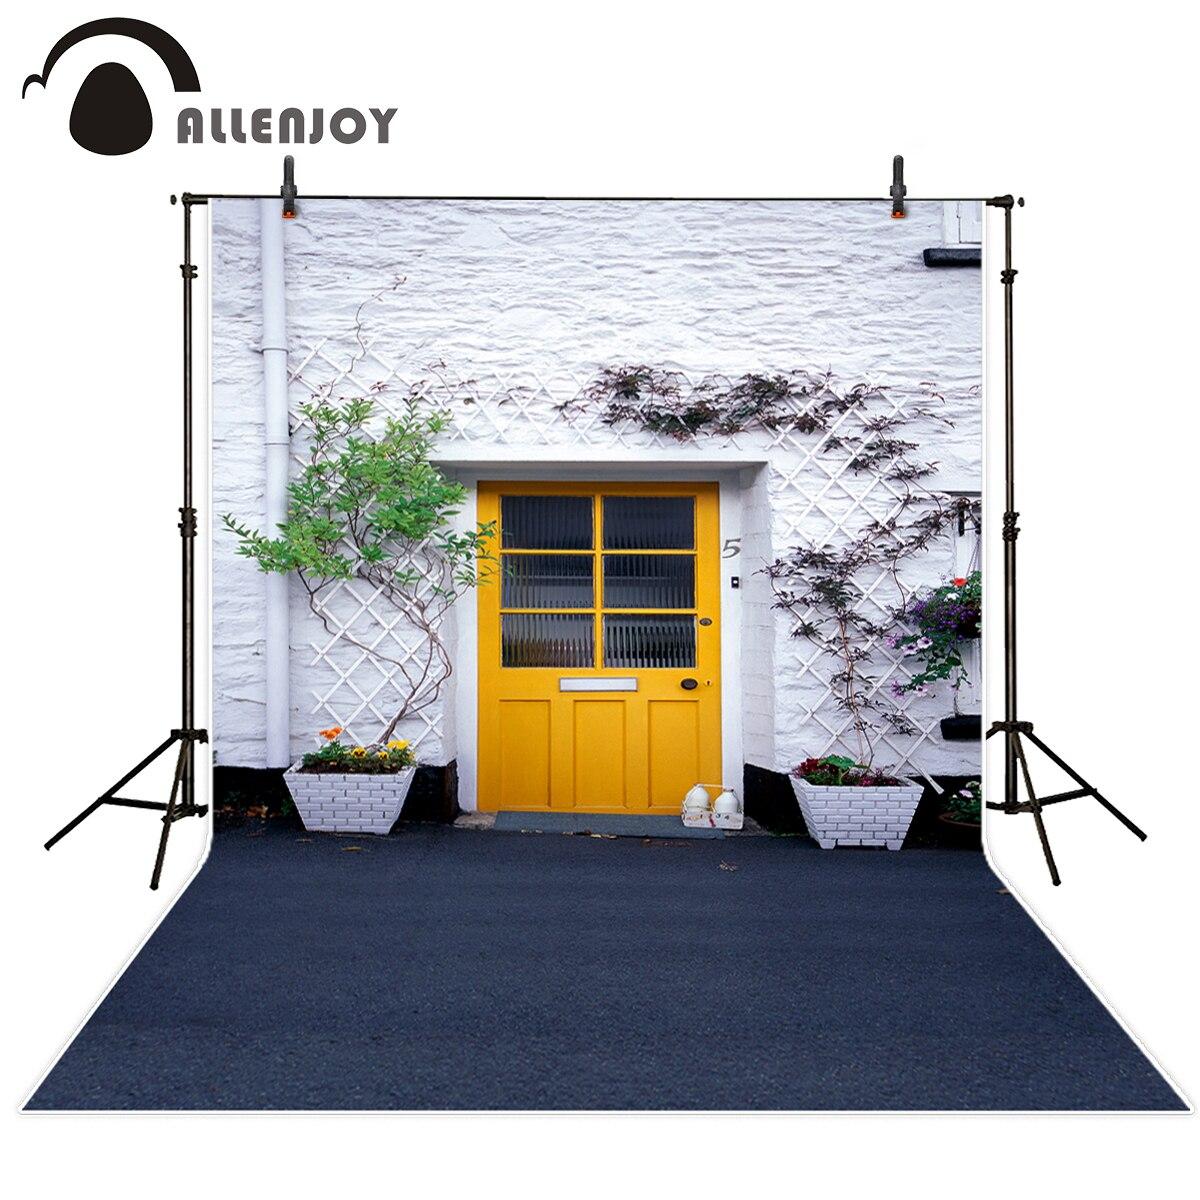 Allenjoy photography backdrops city street yellow door tree children background Background for photo kids photography background